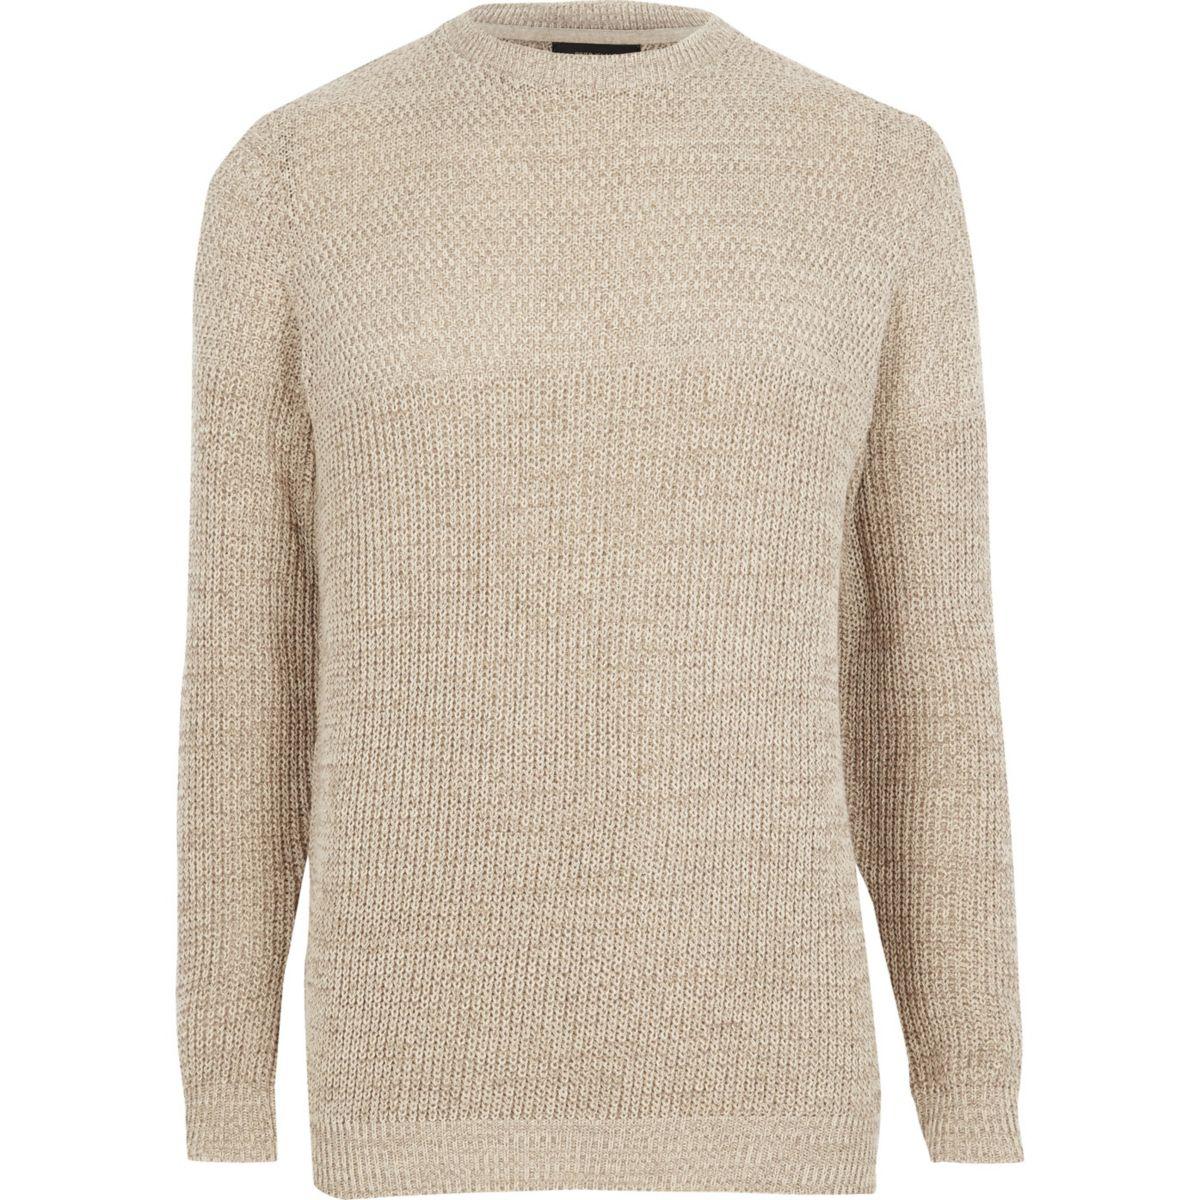 Cream textured knit slim fit  jumper